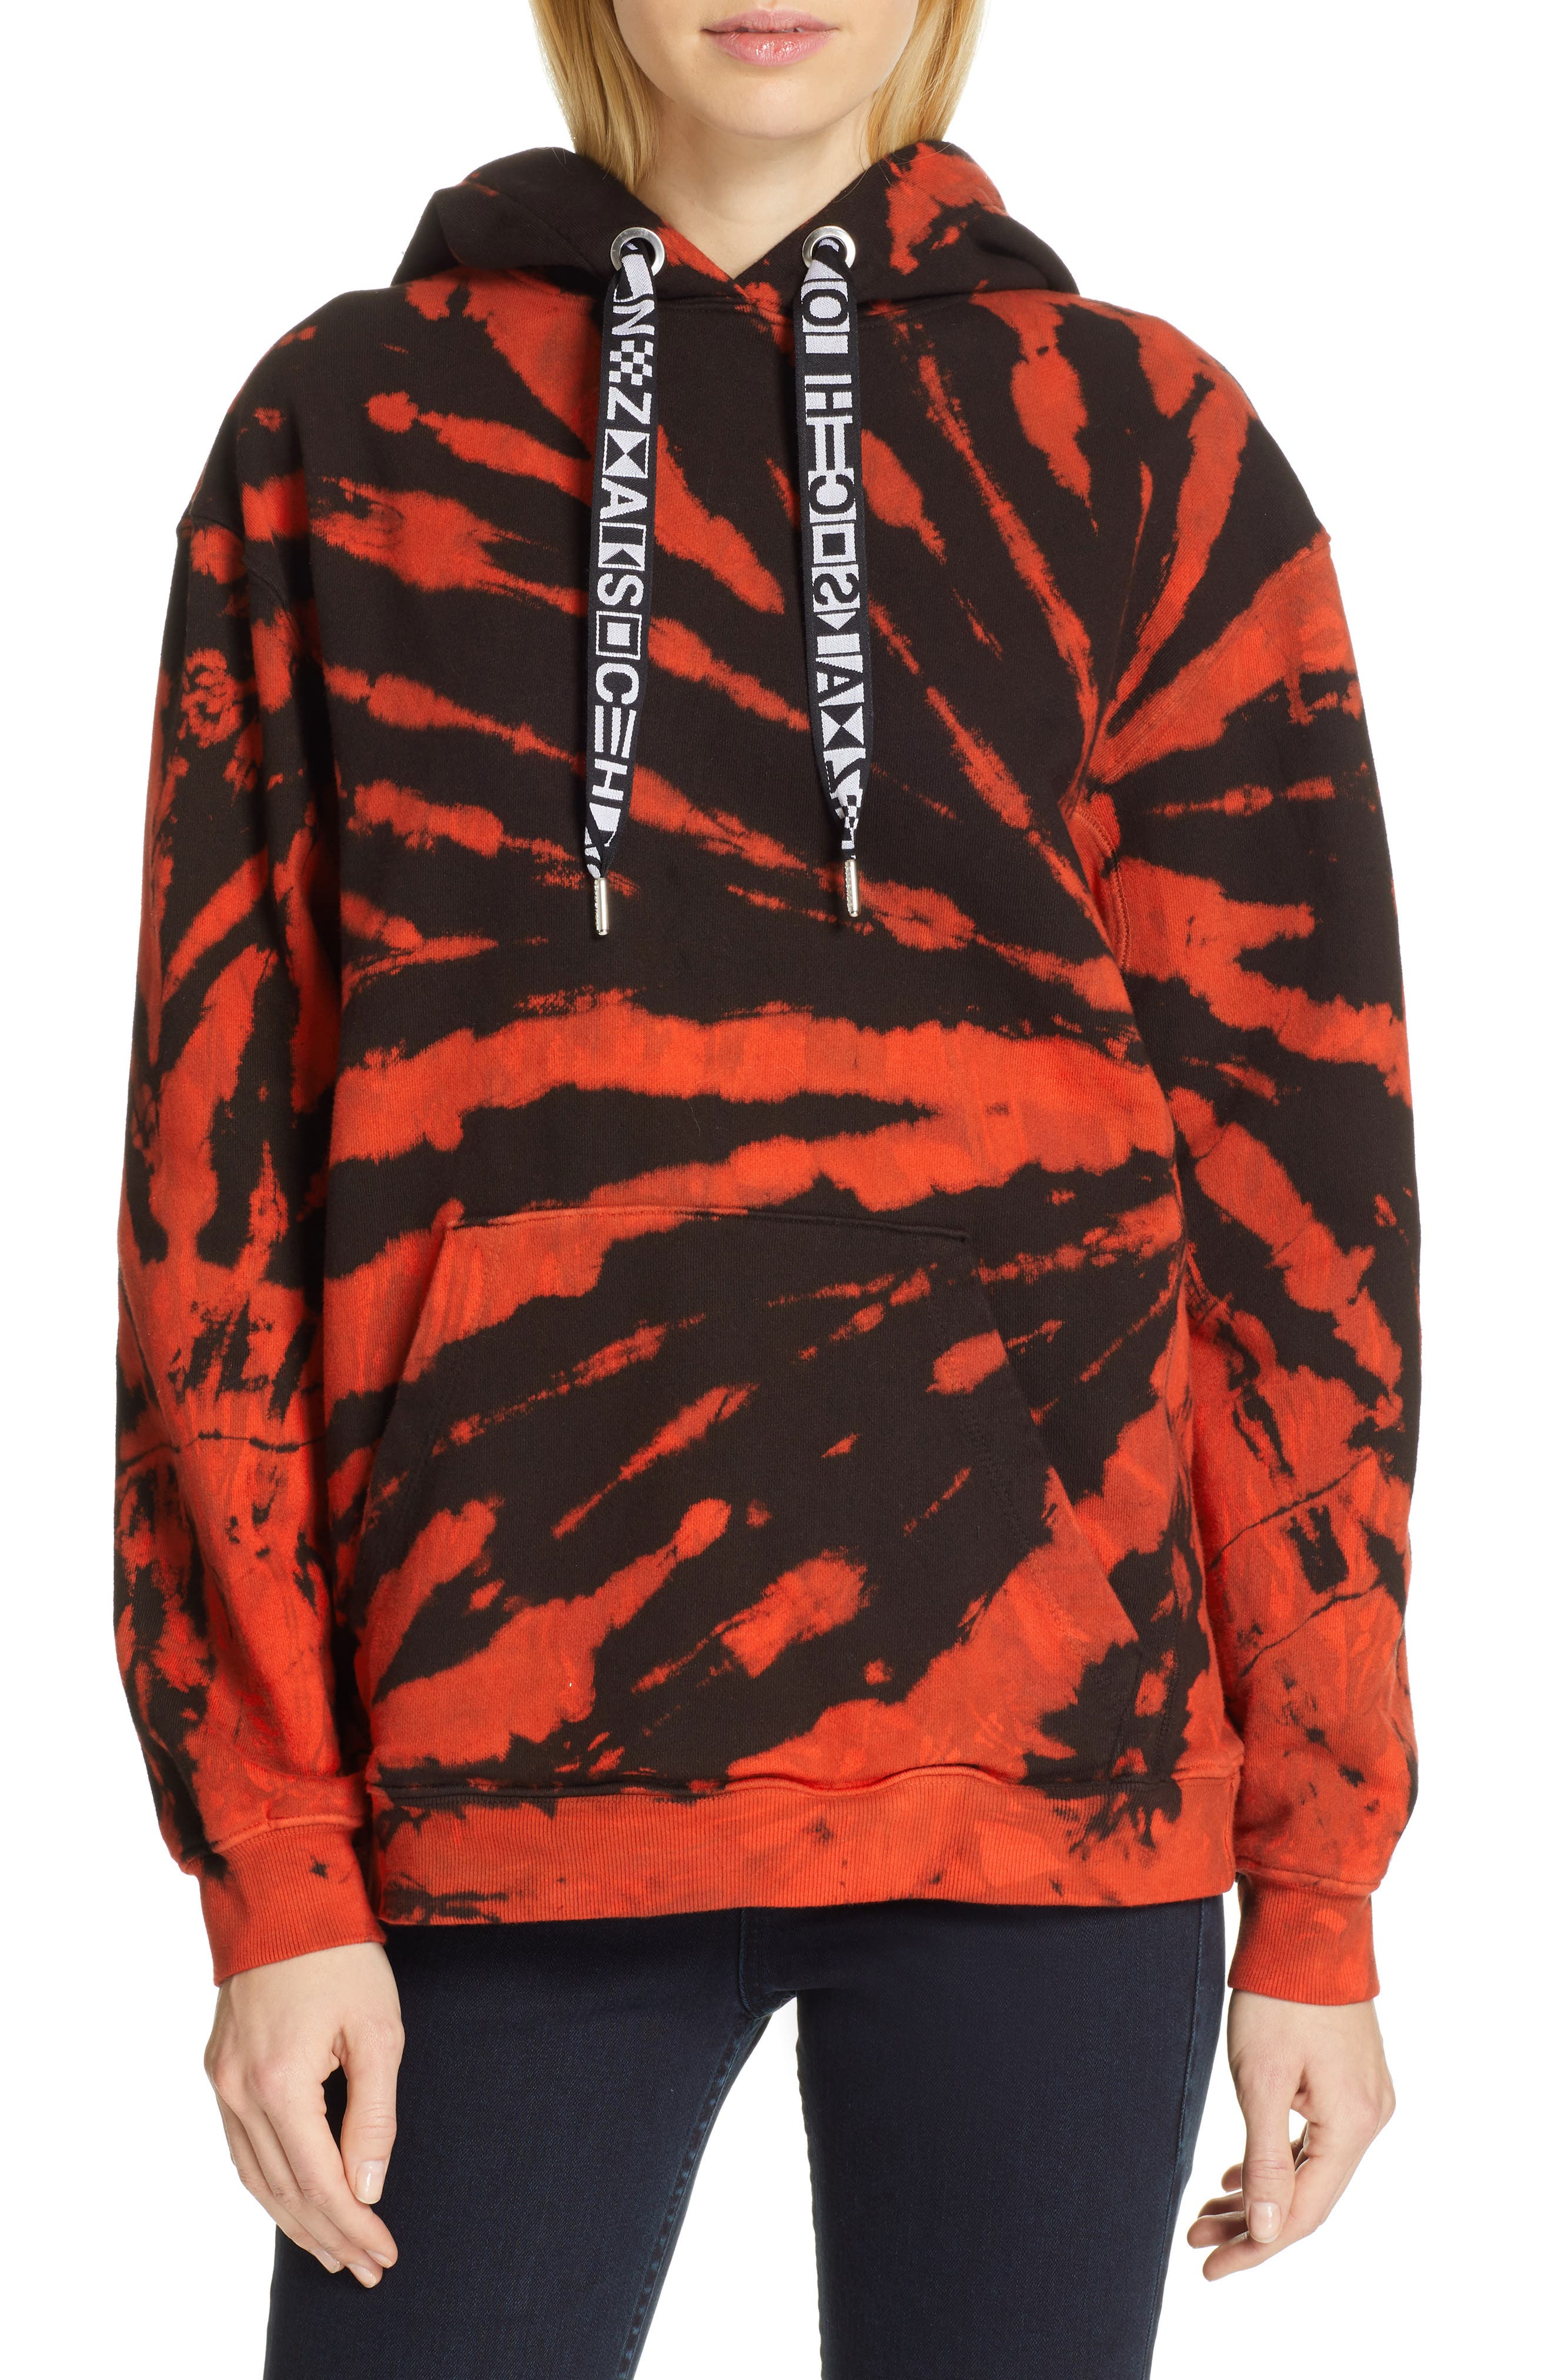 PROENZA SCHOULER, PSWL Tie Dye Hoodie, Main thumbnail 1, color, RED/ BLACK